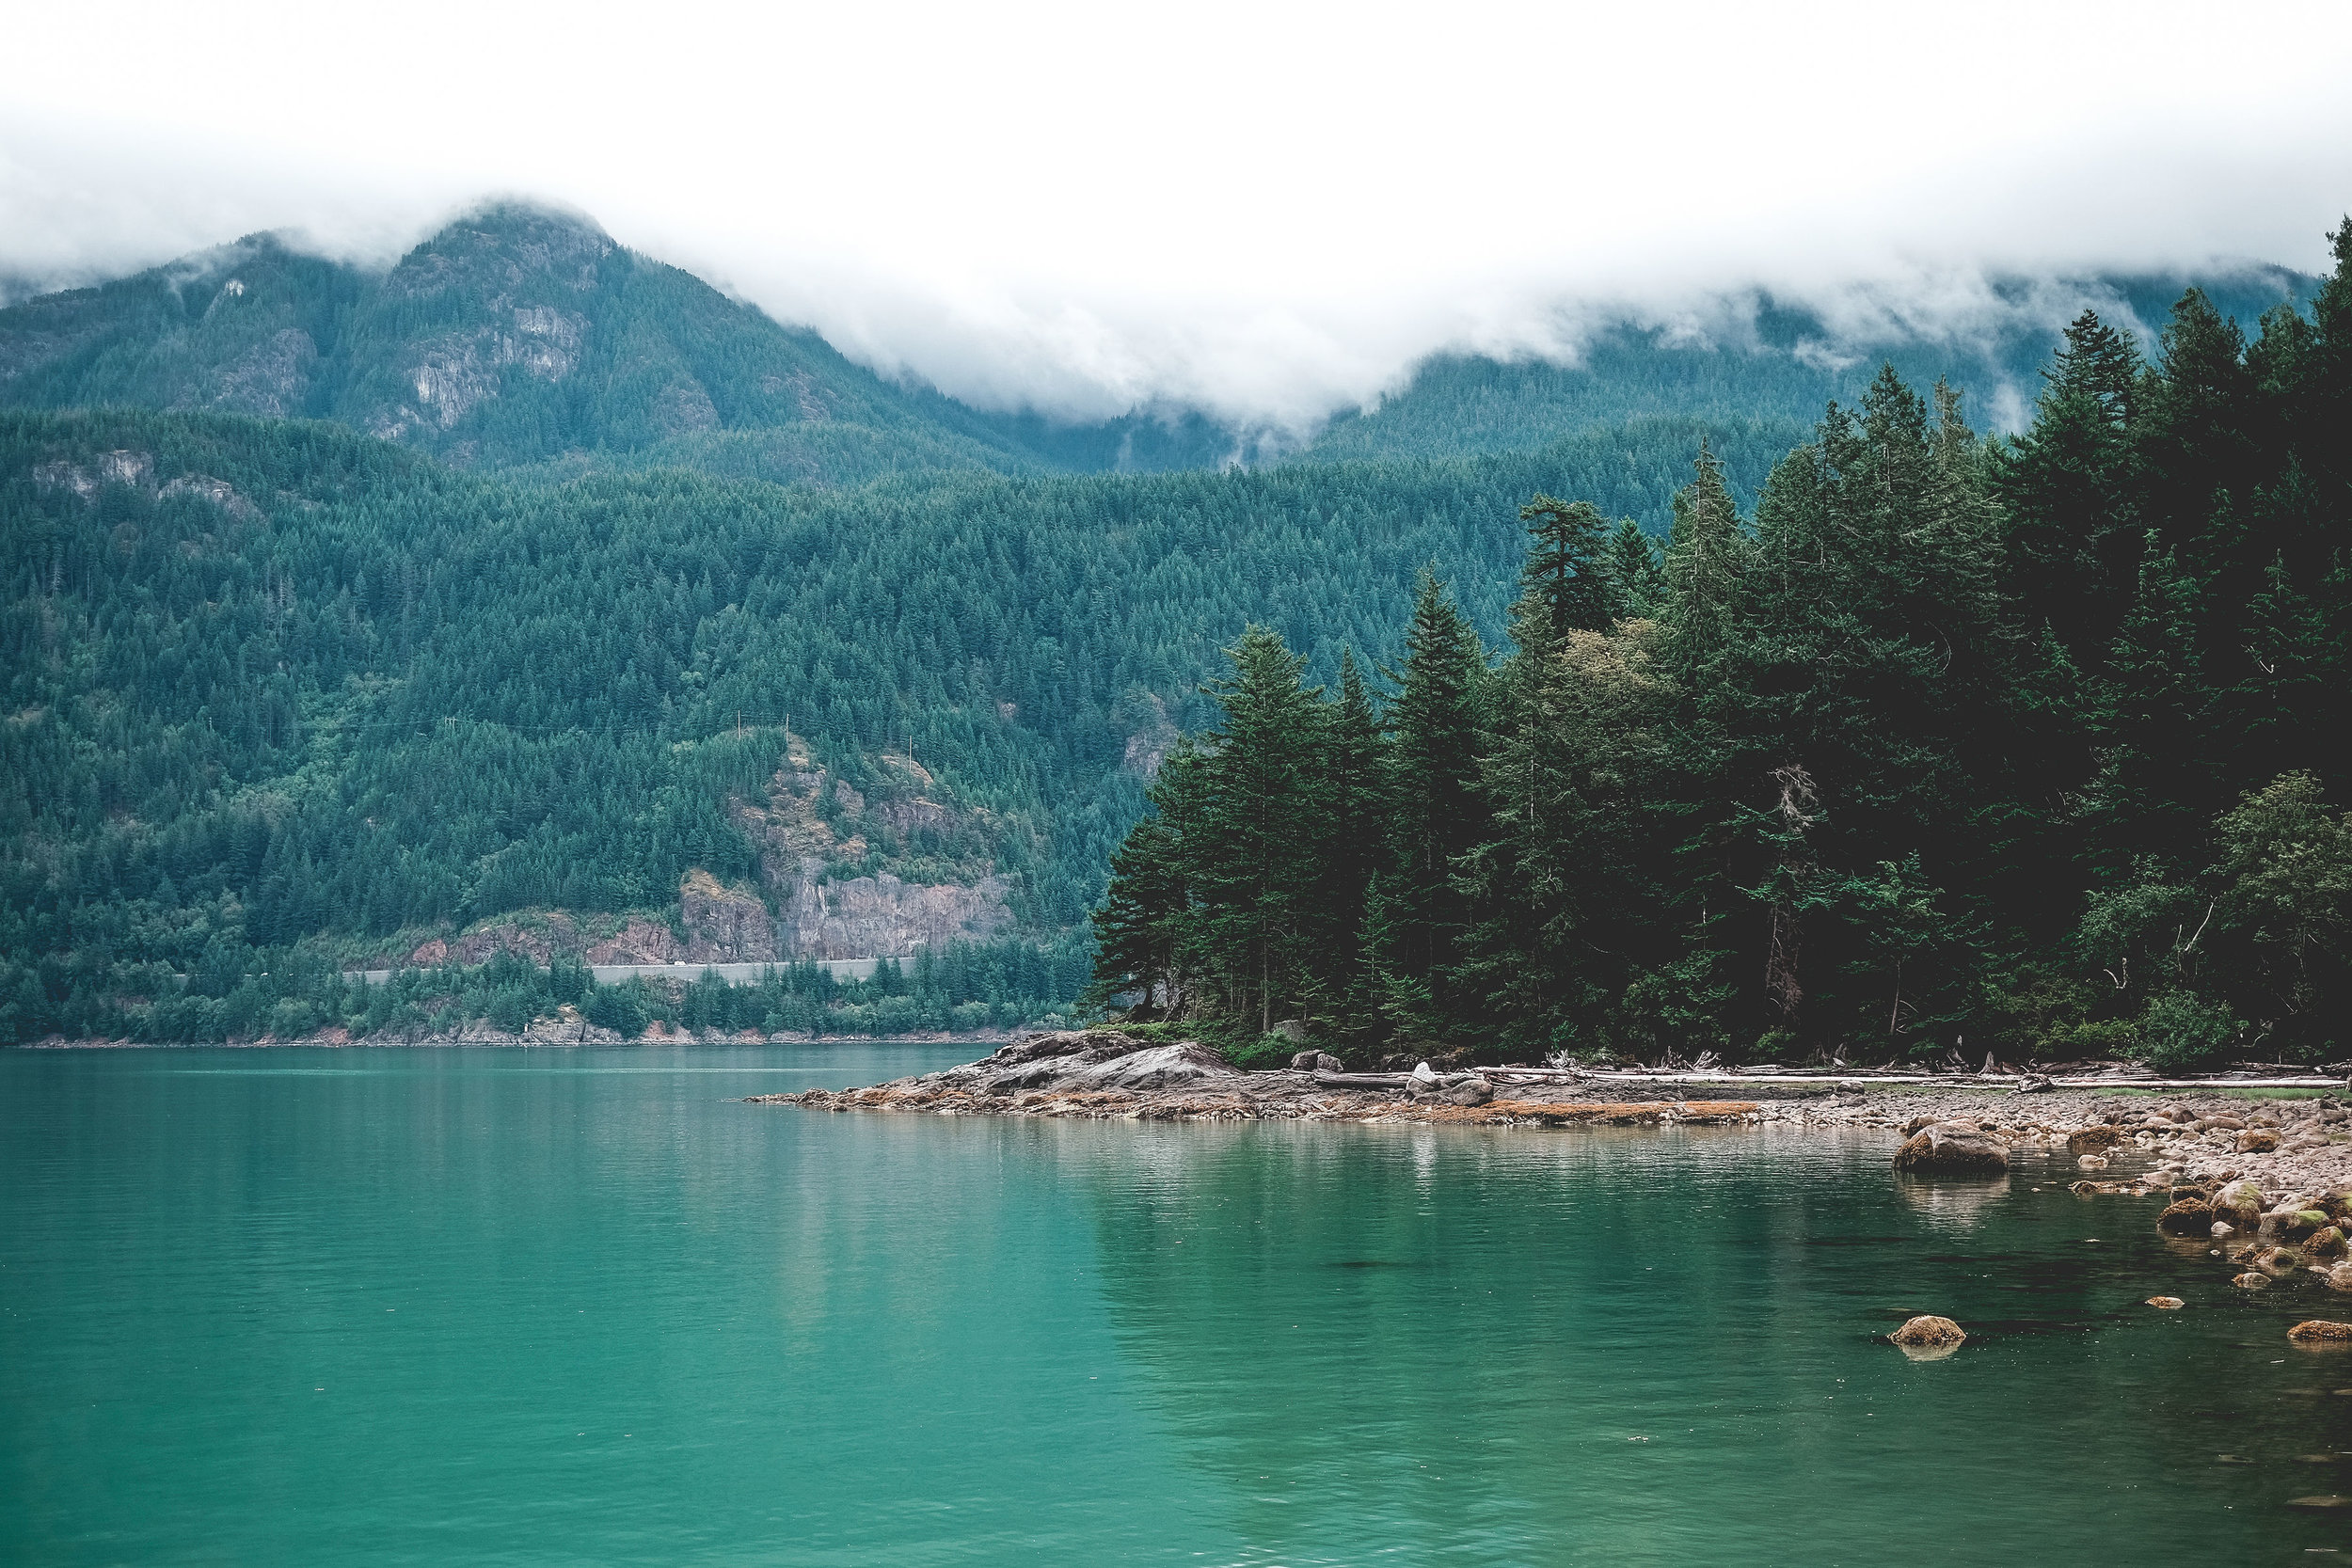 Anvil Island, Howe Sound, British Columbia